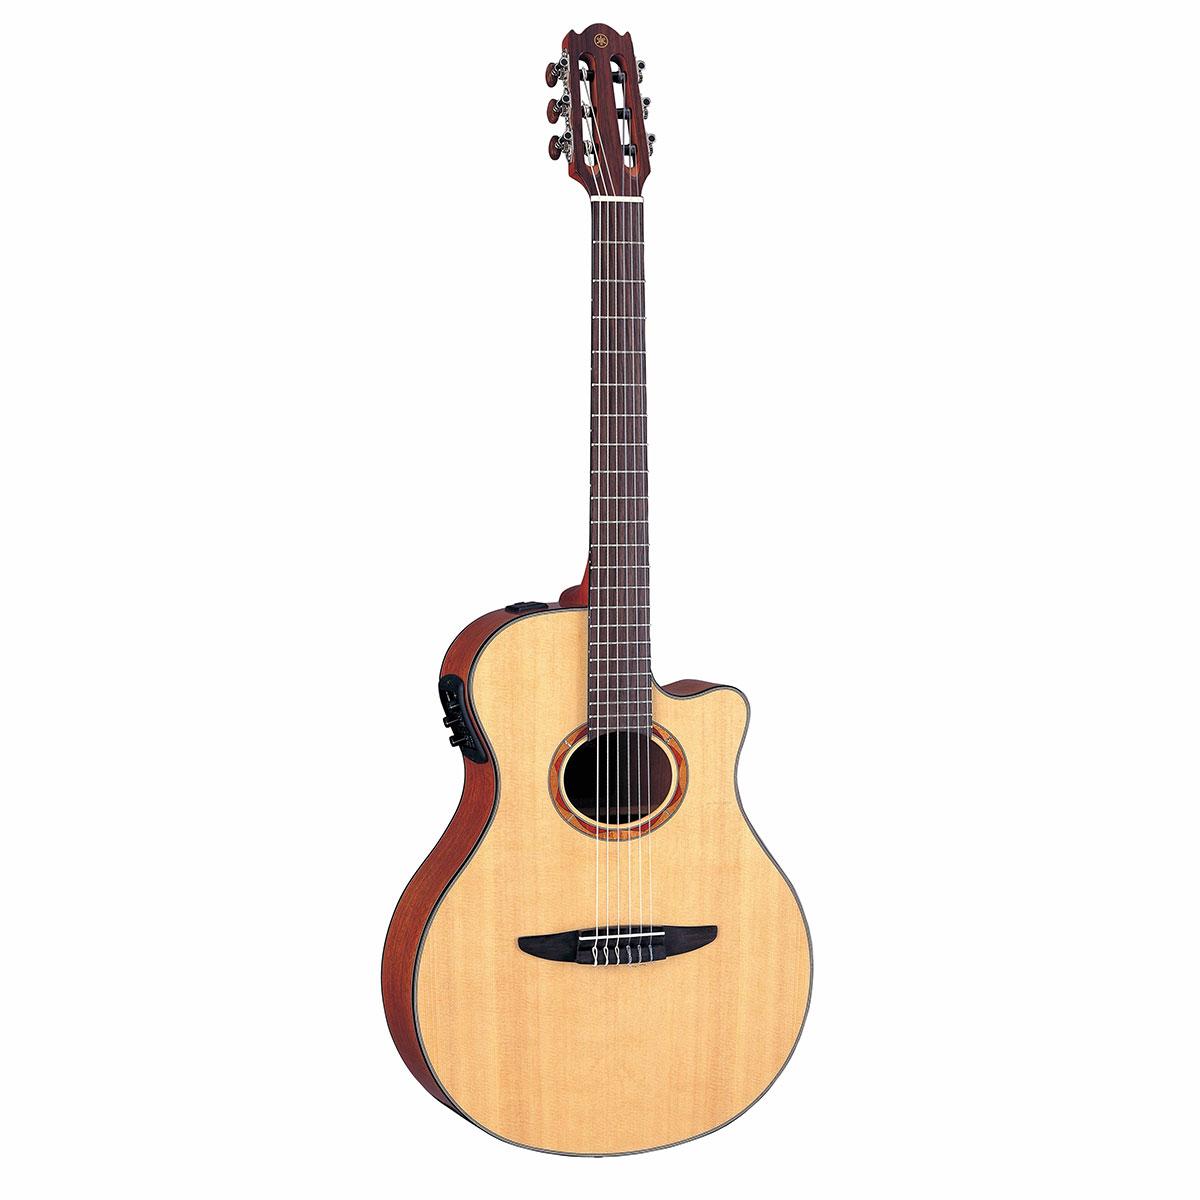 FG-TA YAMAHAYAMAHA トランスアコースティックギター FG-TA, アフロビート:ce9c4216 --- sunward.msk.ru